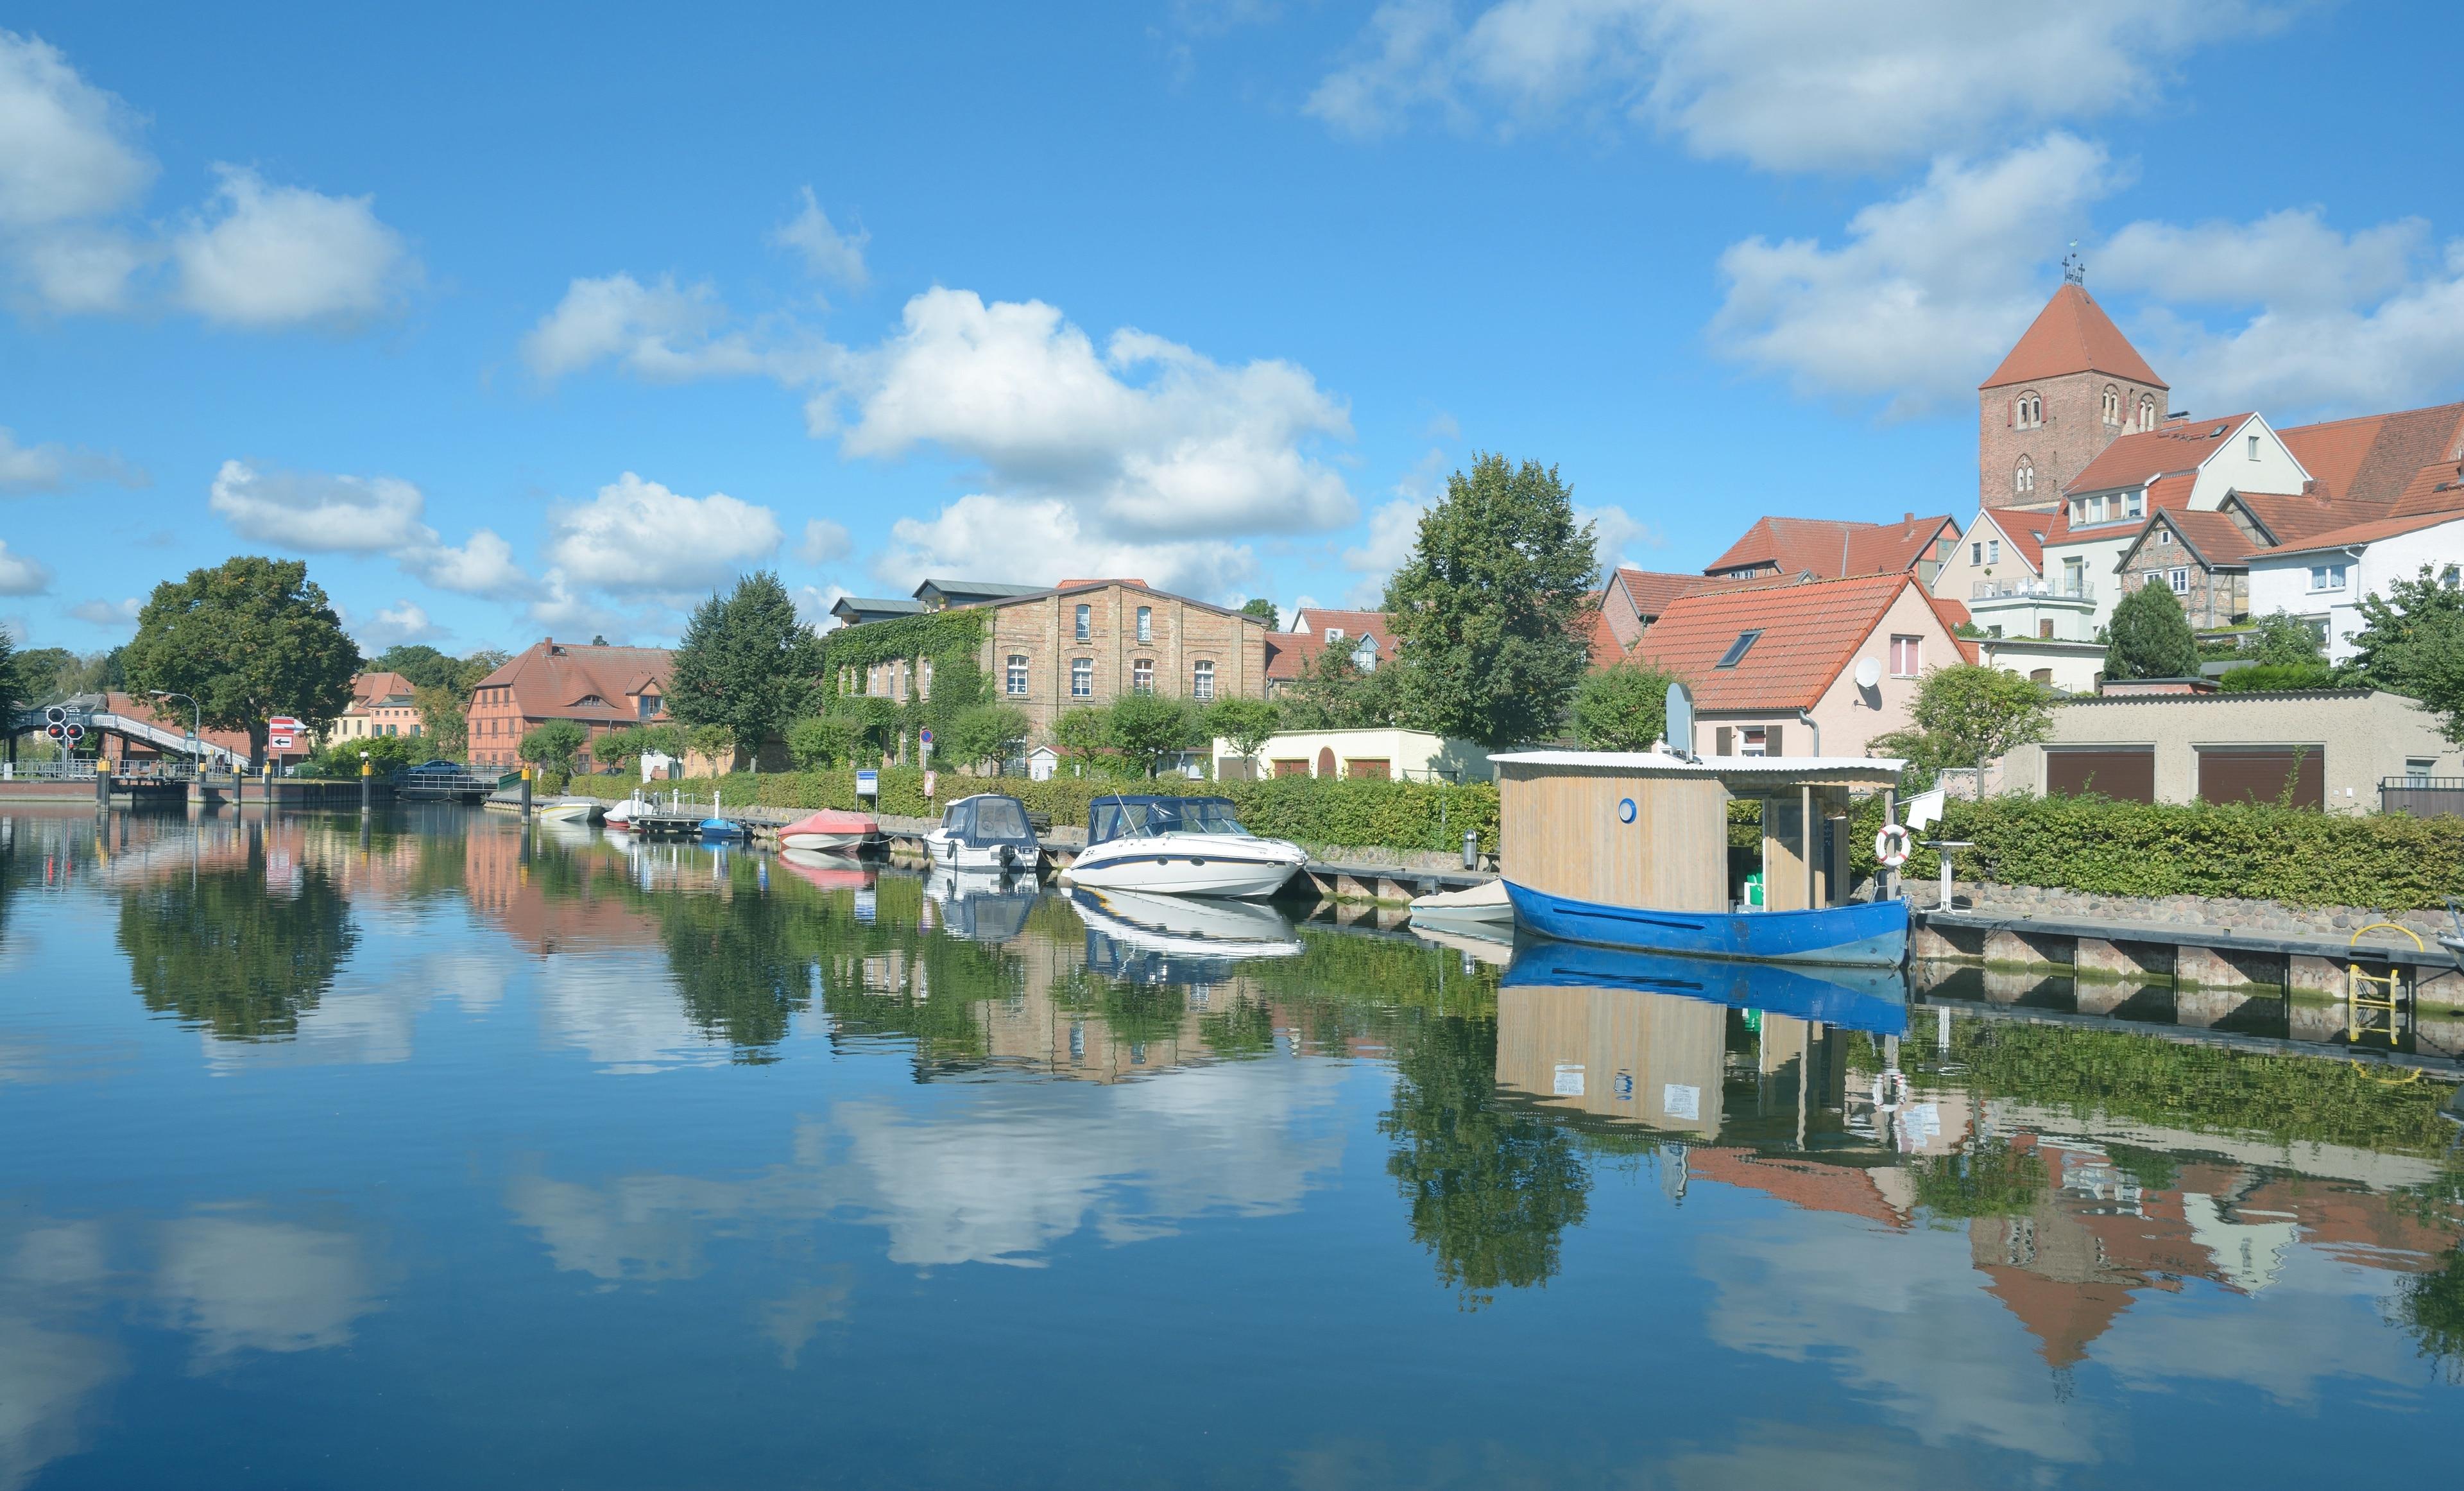 Ludwigslust-Parchim District, Mecklenburg-West Pomerania, Germany